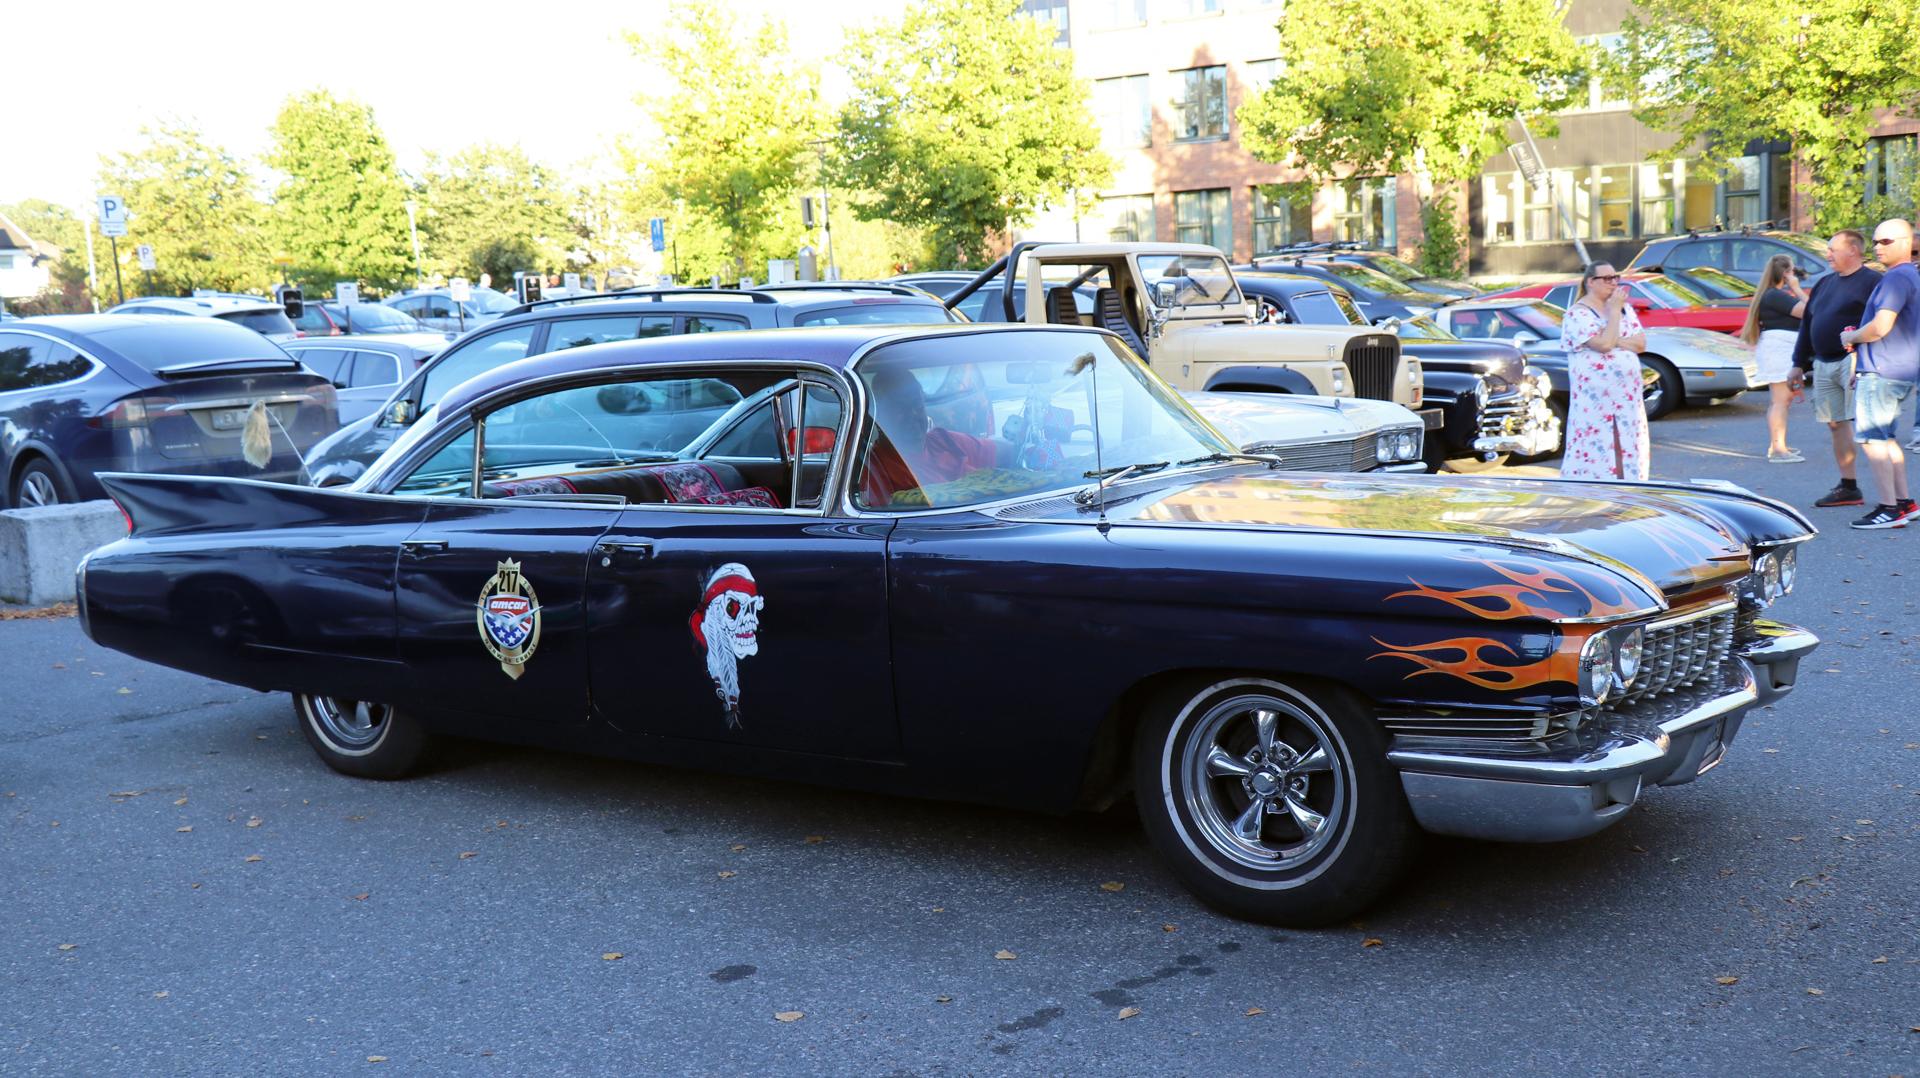 219-1960 Cadillac Sedan deVille 01. Eiere- medlem